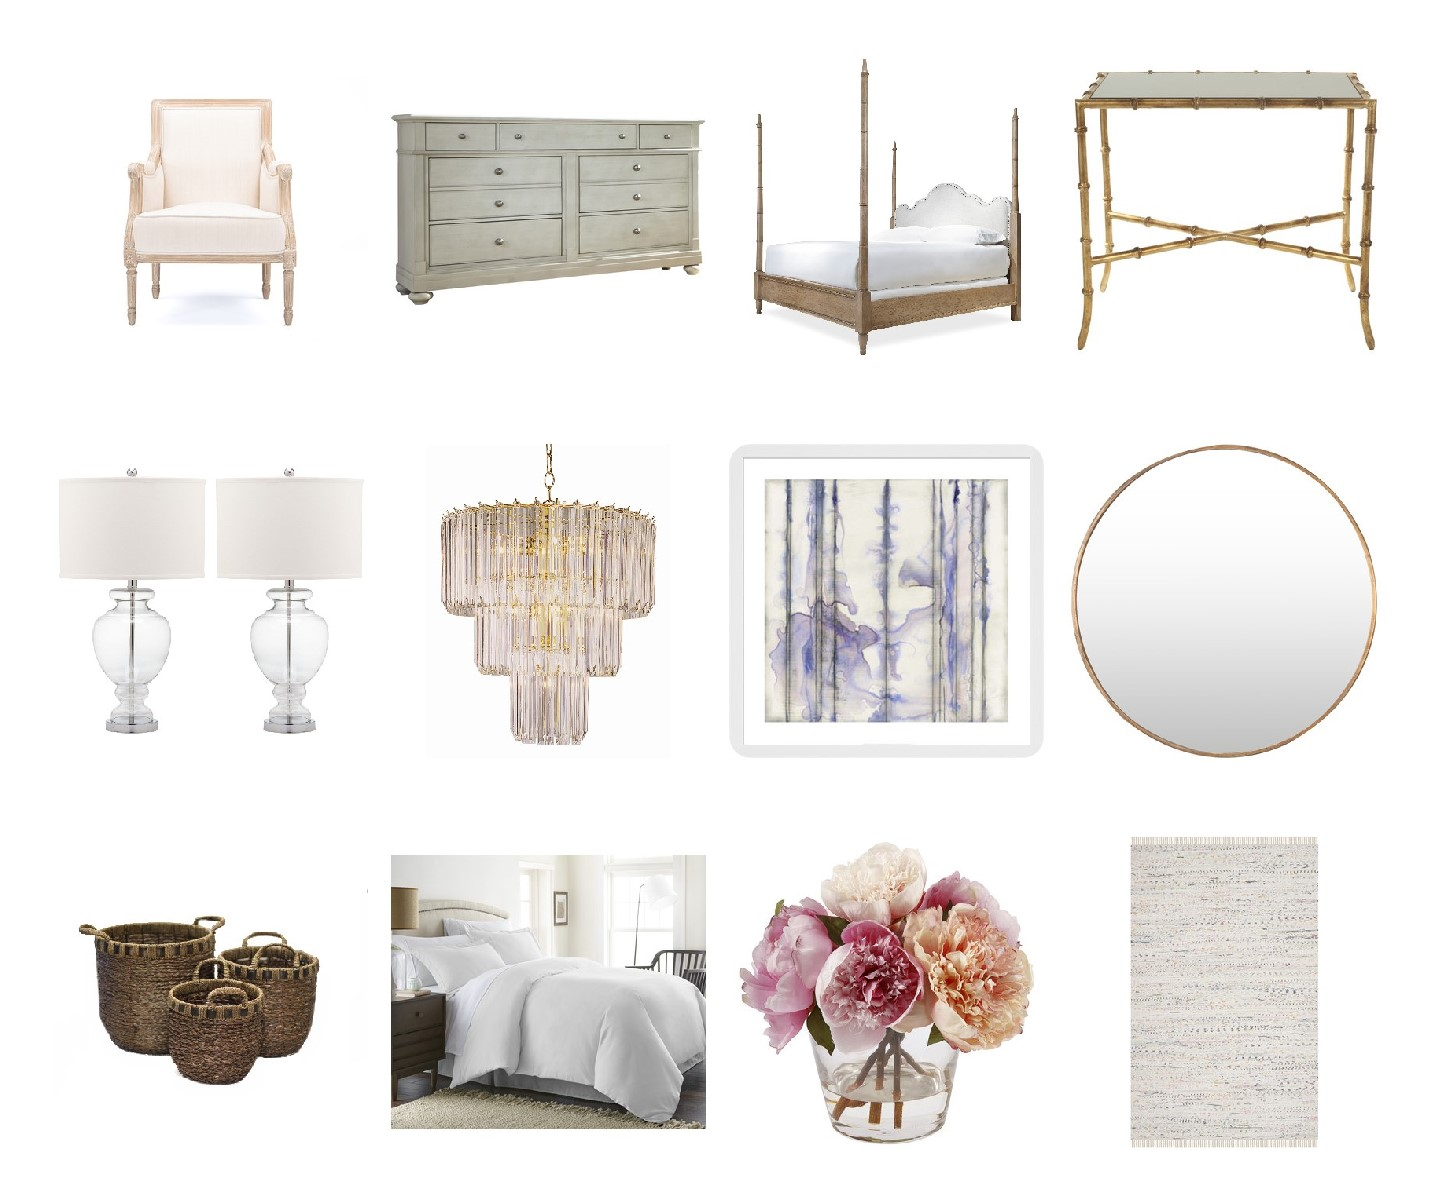 New Year, New Room Bedroom Ideas Wayfair.com